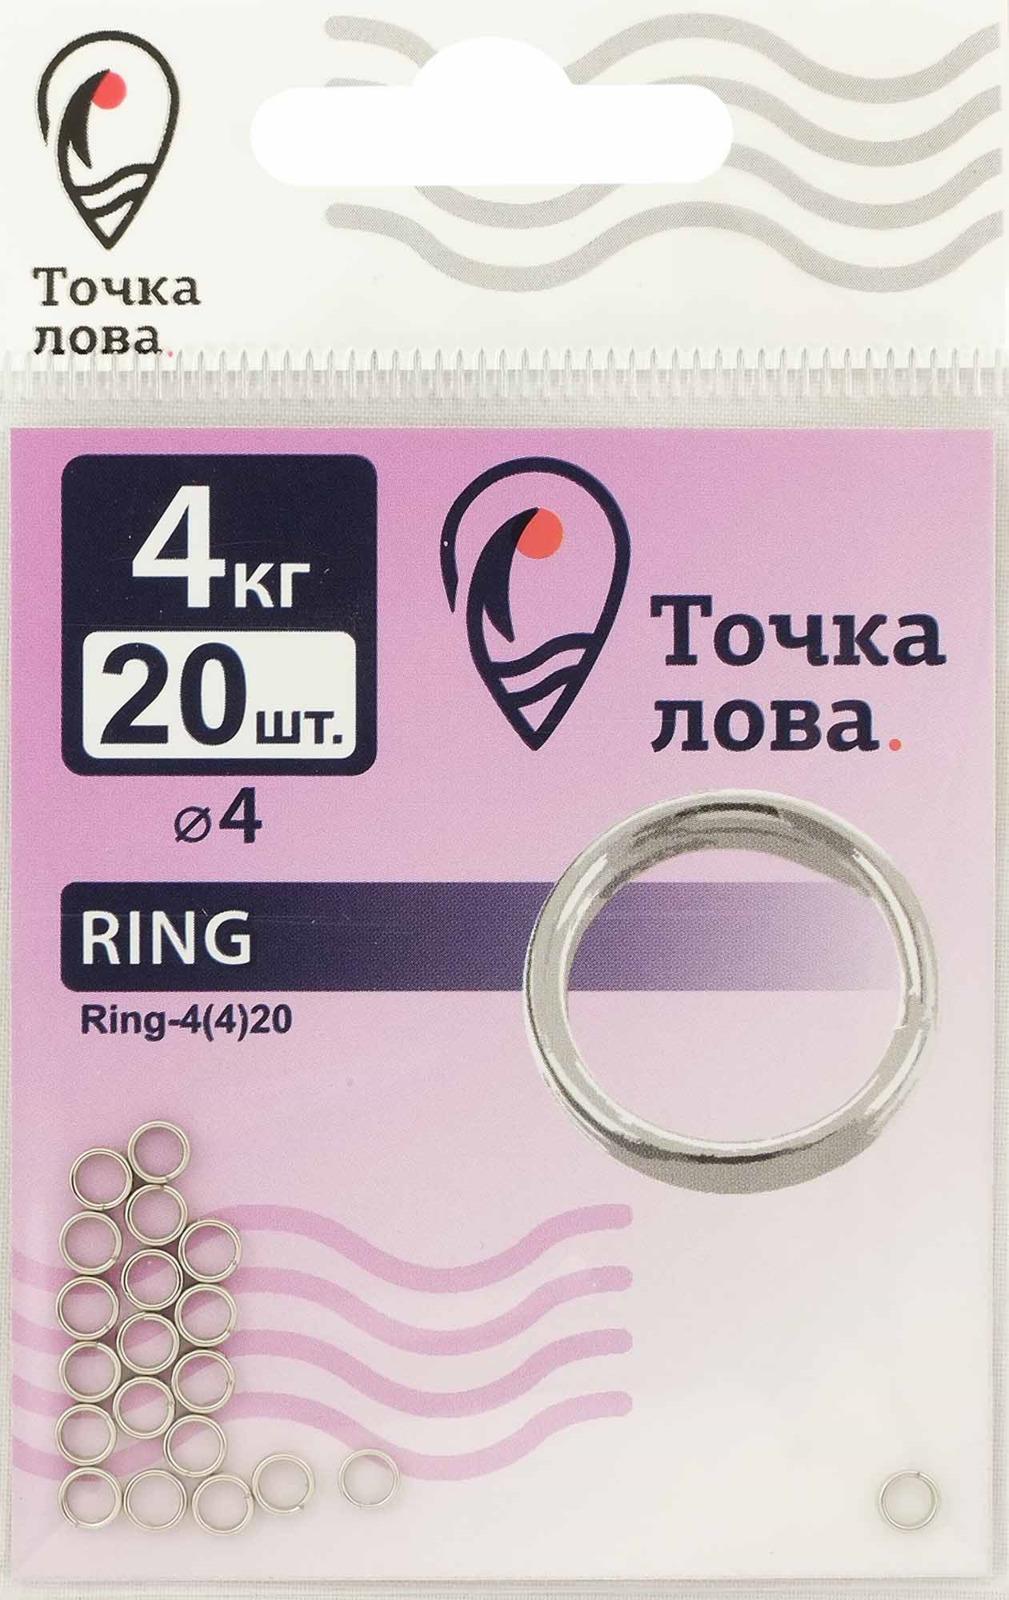 Аксессуар для рыбалки Точка Лова Заводное кольцо, Ring-4(4), 20 шт